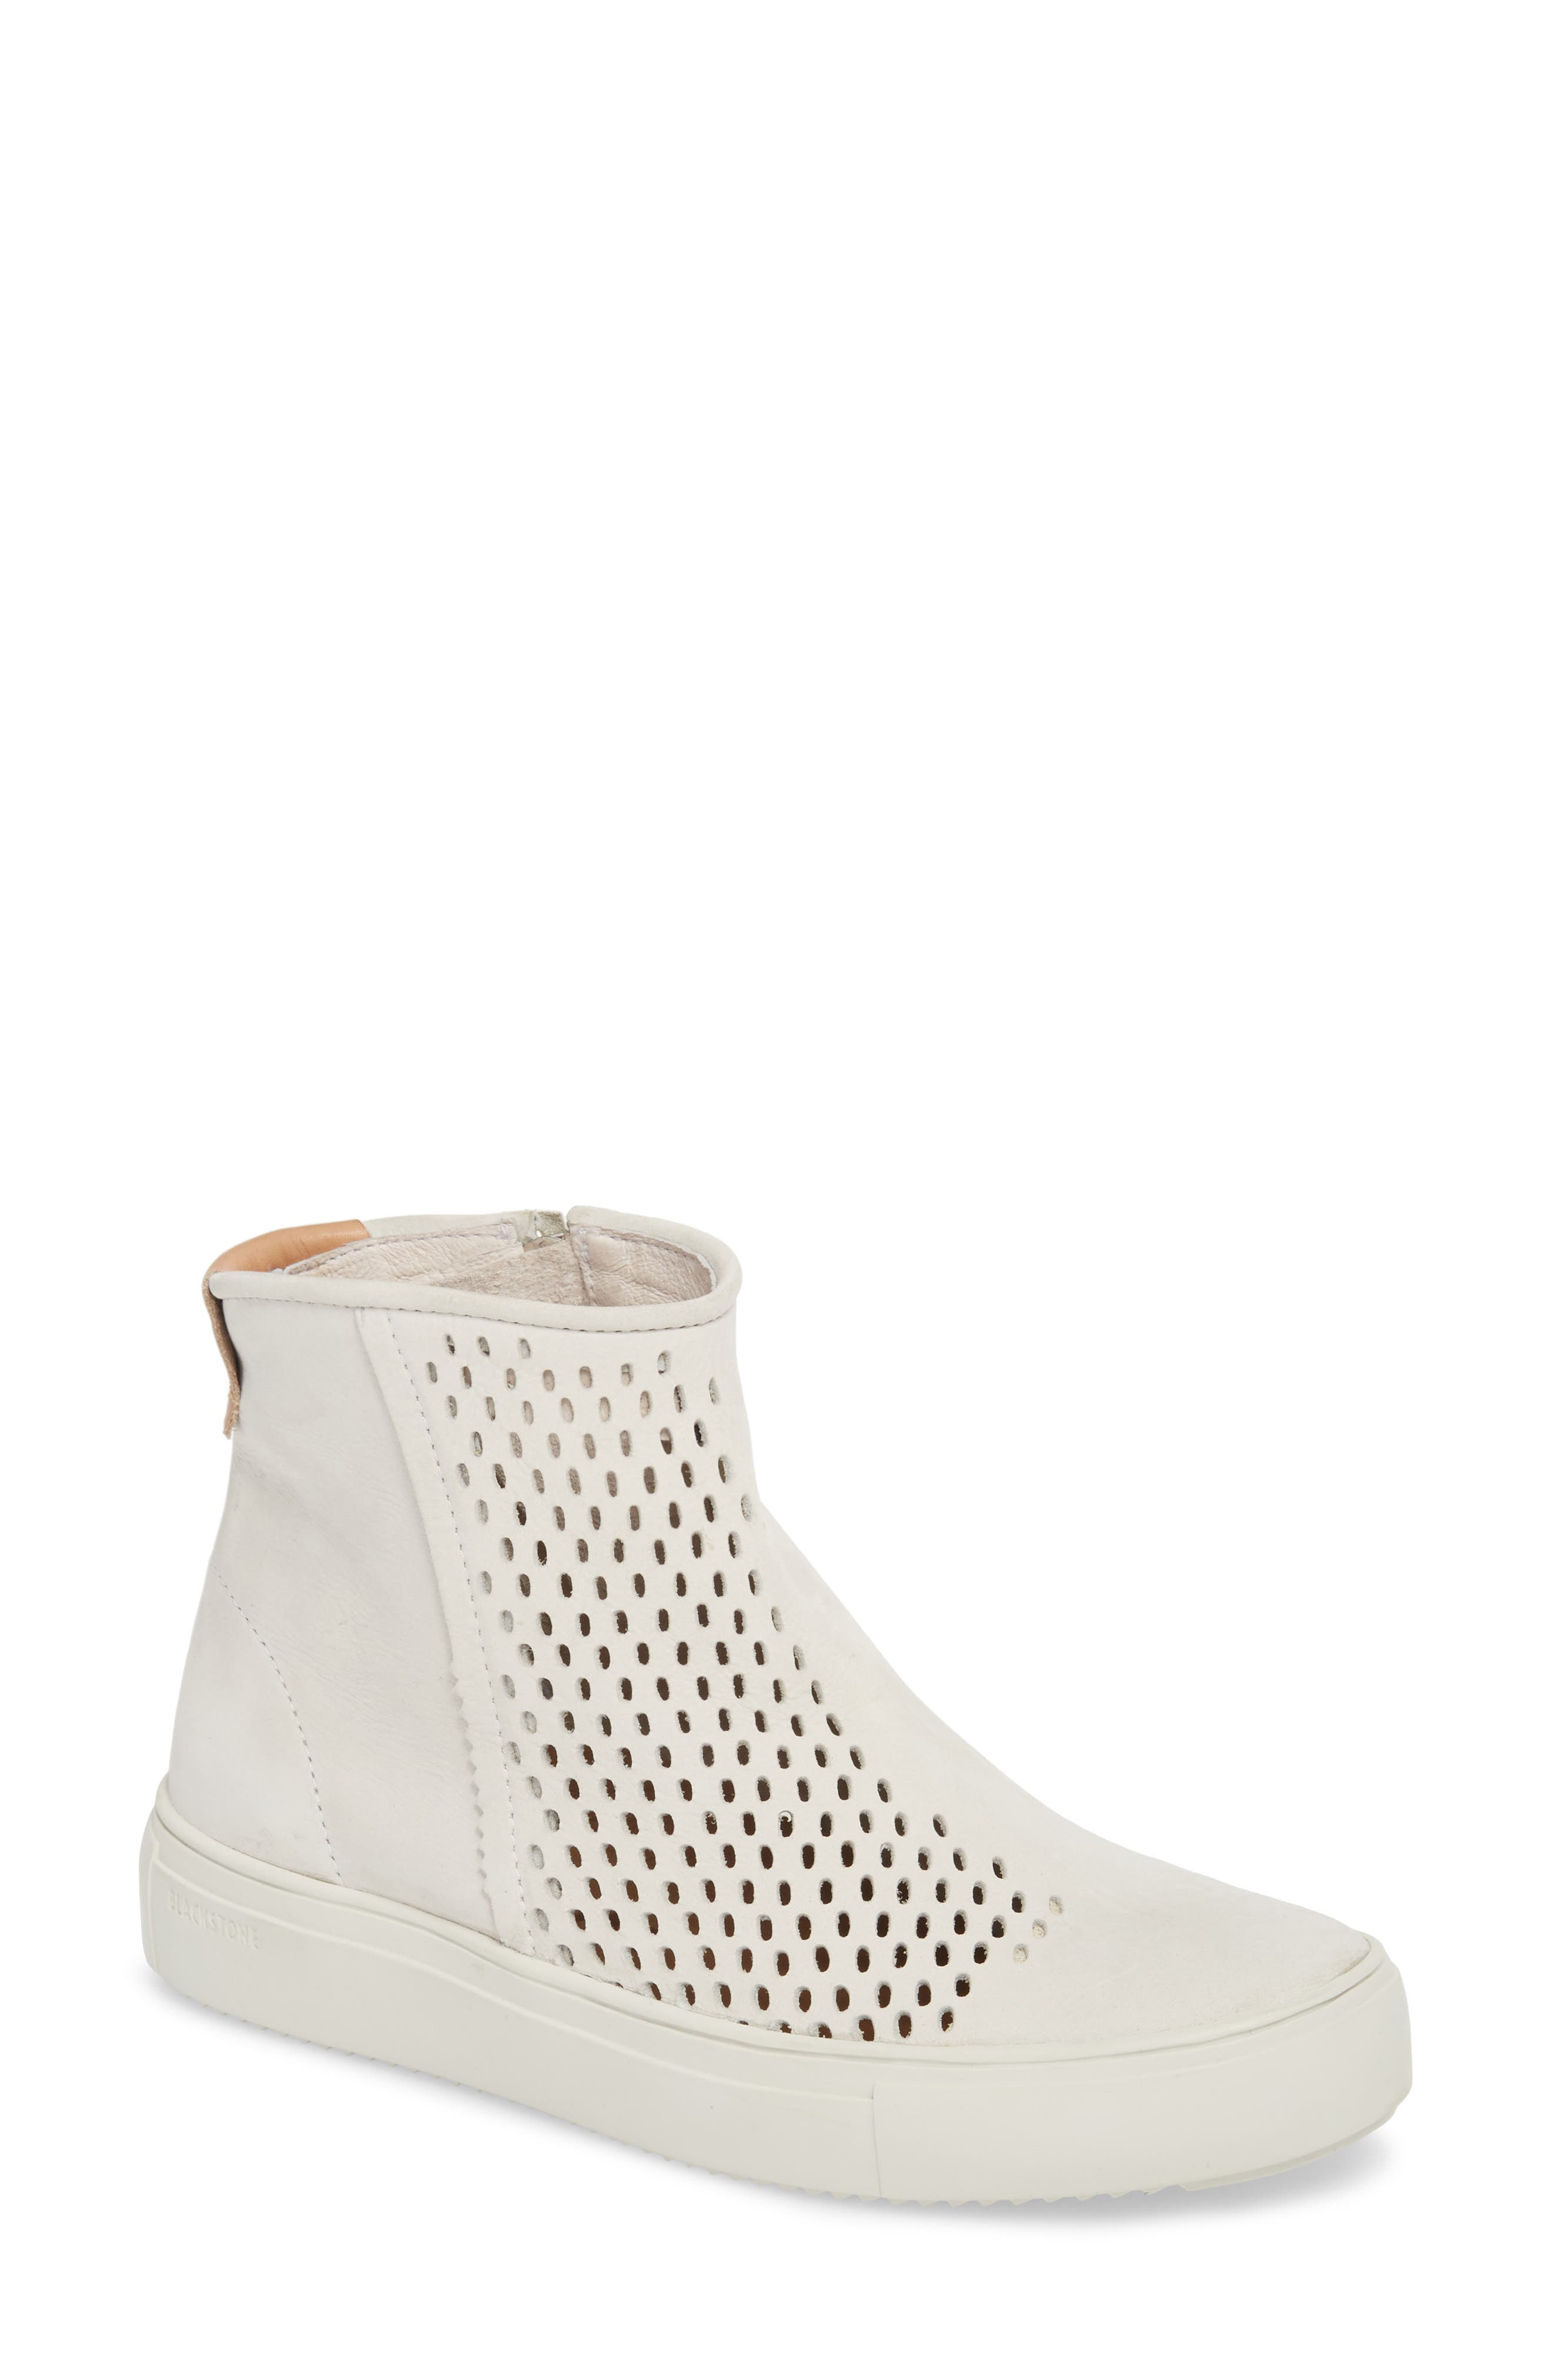 Image of Blackstone Perforated Slip-On Sneaker